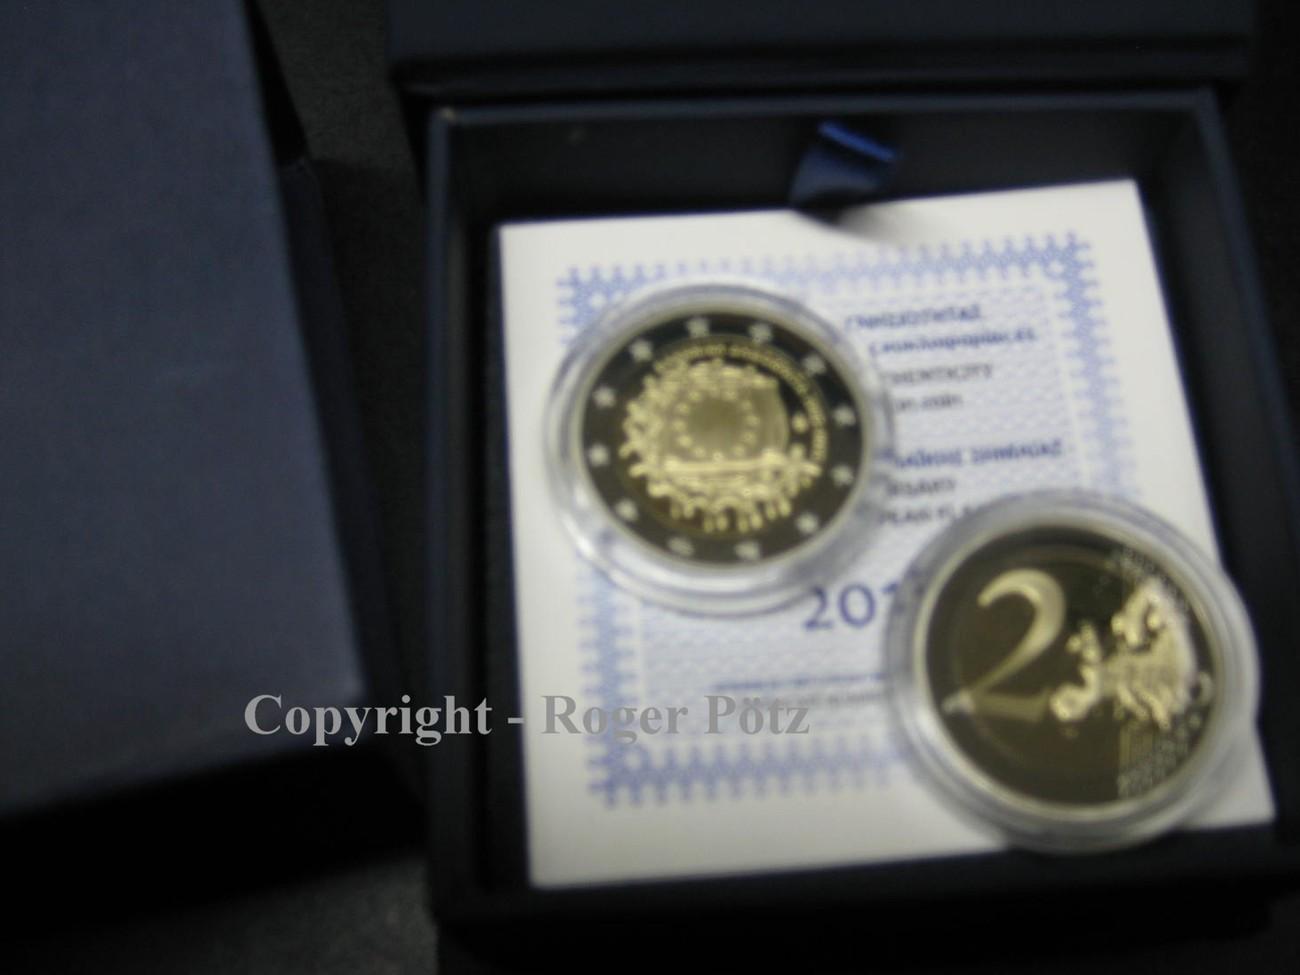 2 Euro 2015 GRIECHENLAND 2 Euro Sondergedenkmünze 2015 Europaflagge 1. Jahrgang in PP nur 1500 Exemplare PP ( polierte Platte ) OVP